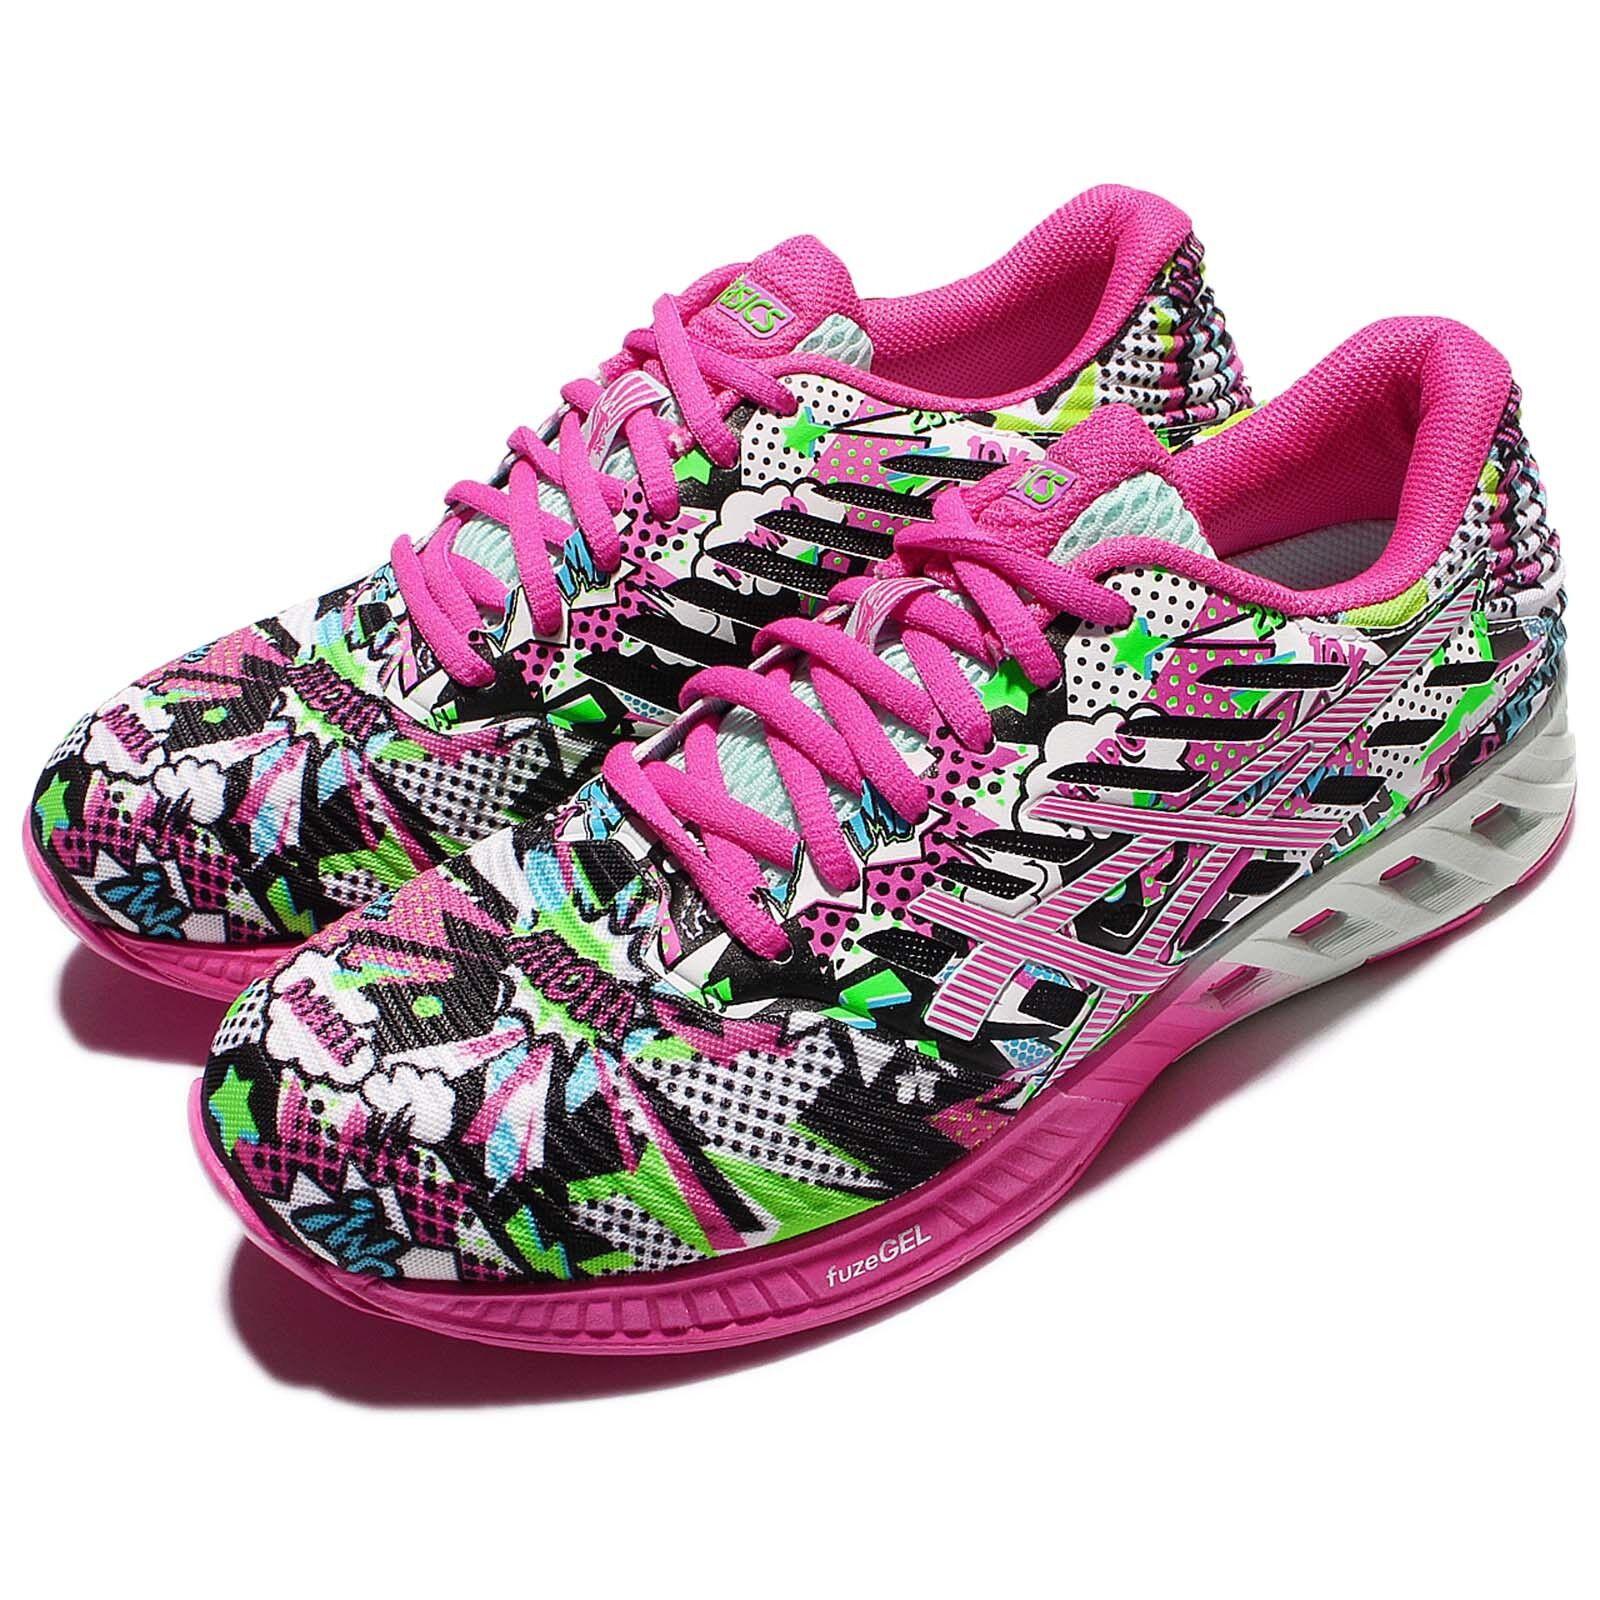 Asics FuzeX Multi-color Pink Black Green Women Running Running Running shoes Sneakers T6K8N-0120 e1e115